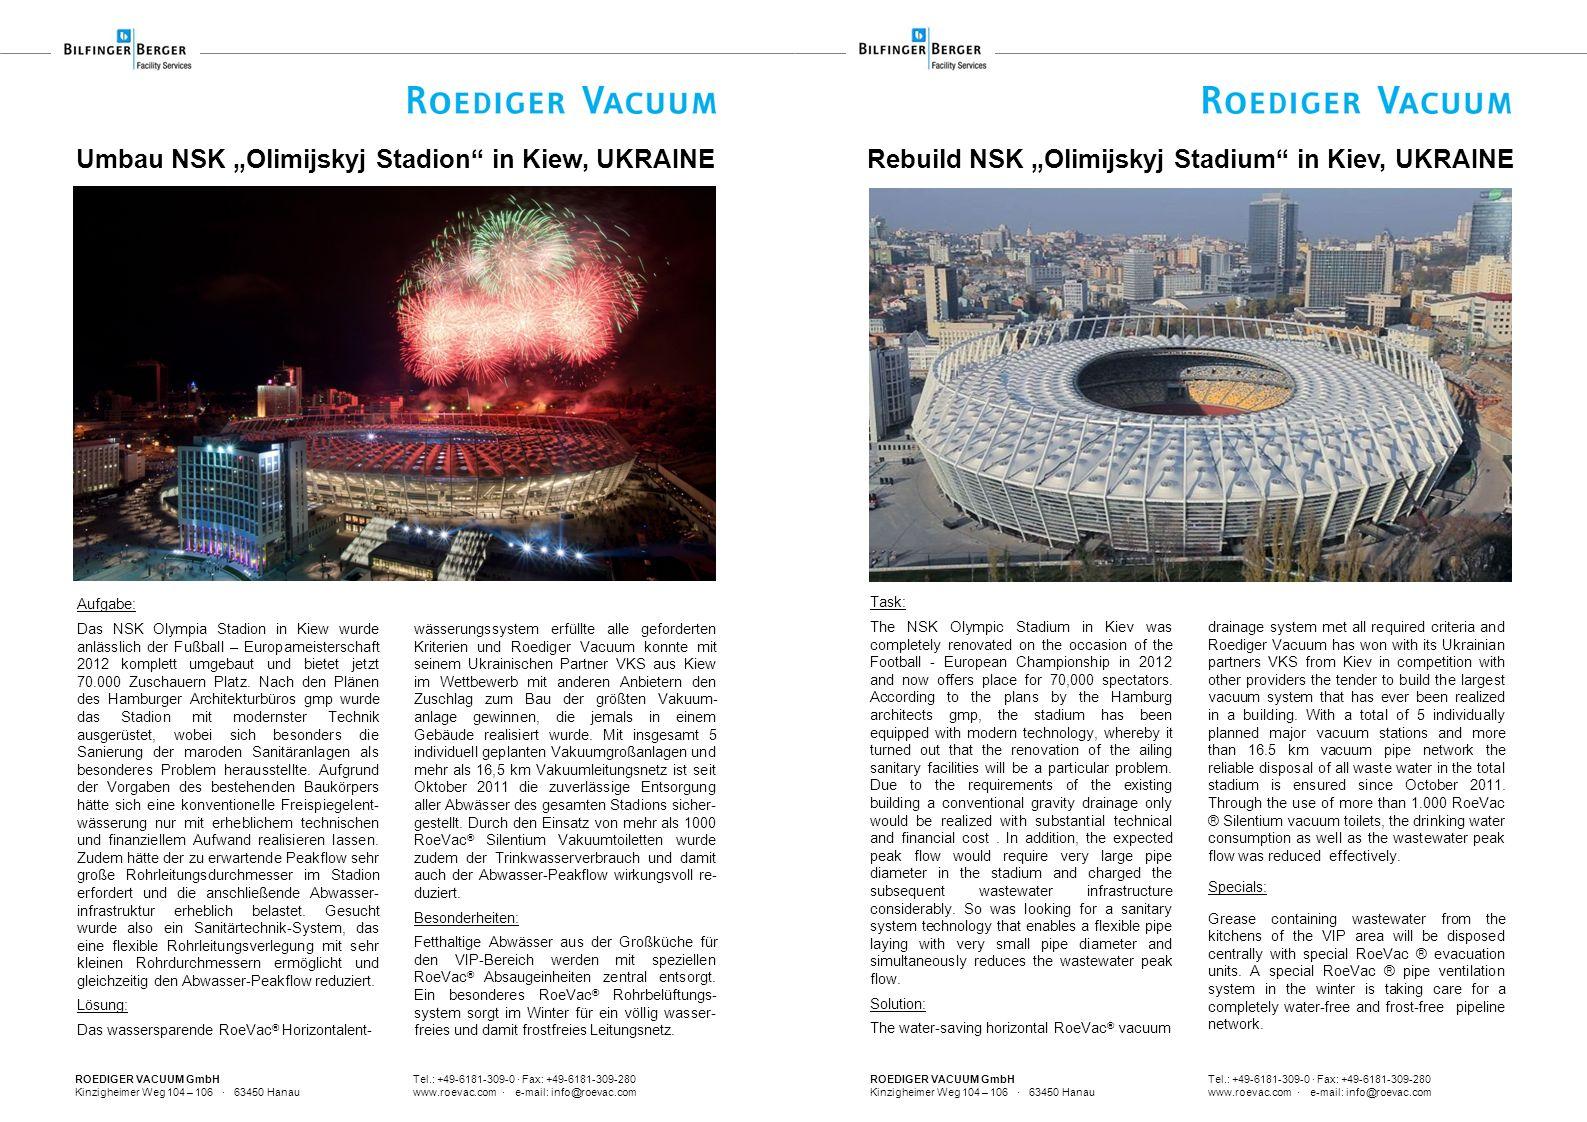 "Umbau NSK ""Olimijskyj Stadion in Kiew, UKRAINE"